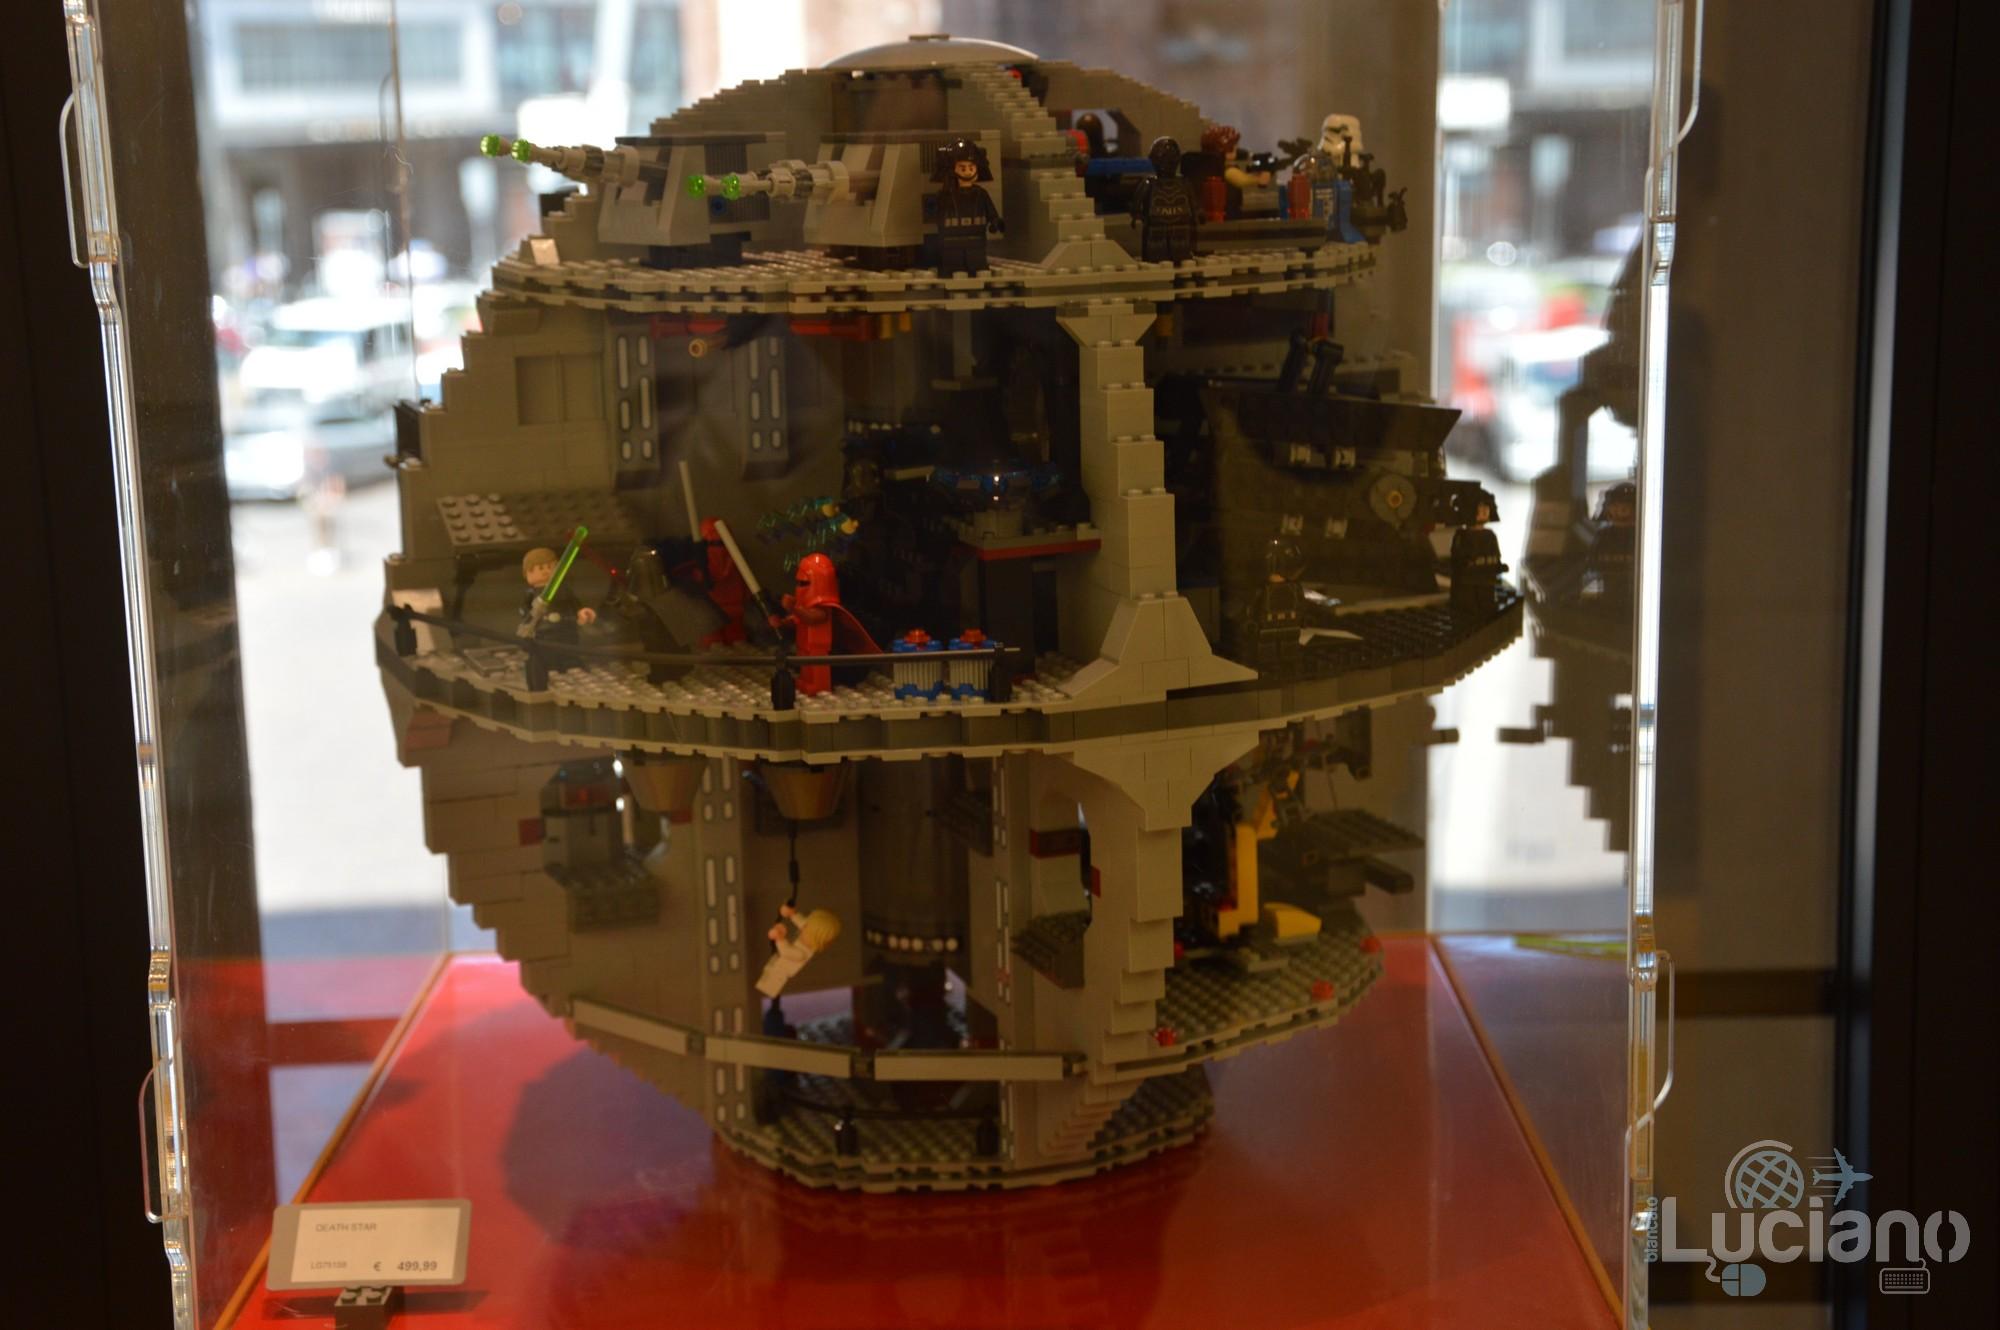 Lego Store - Modellino Star Wars - Milano - Lombardia - Italia